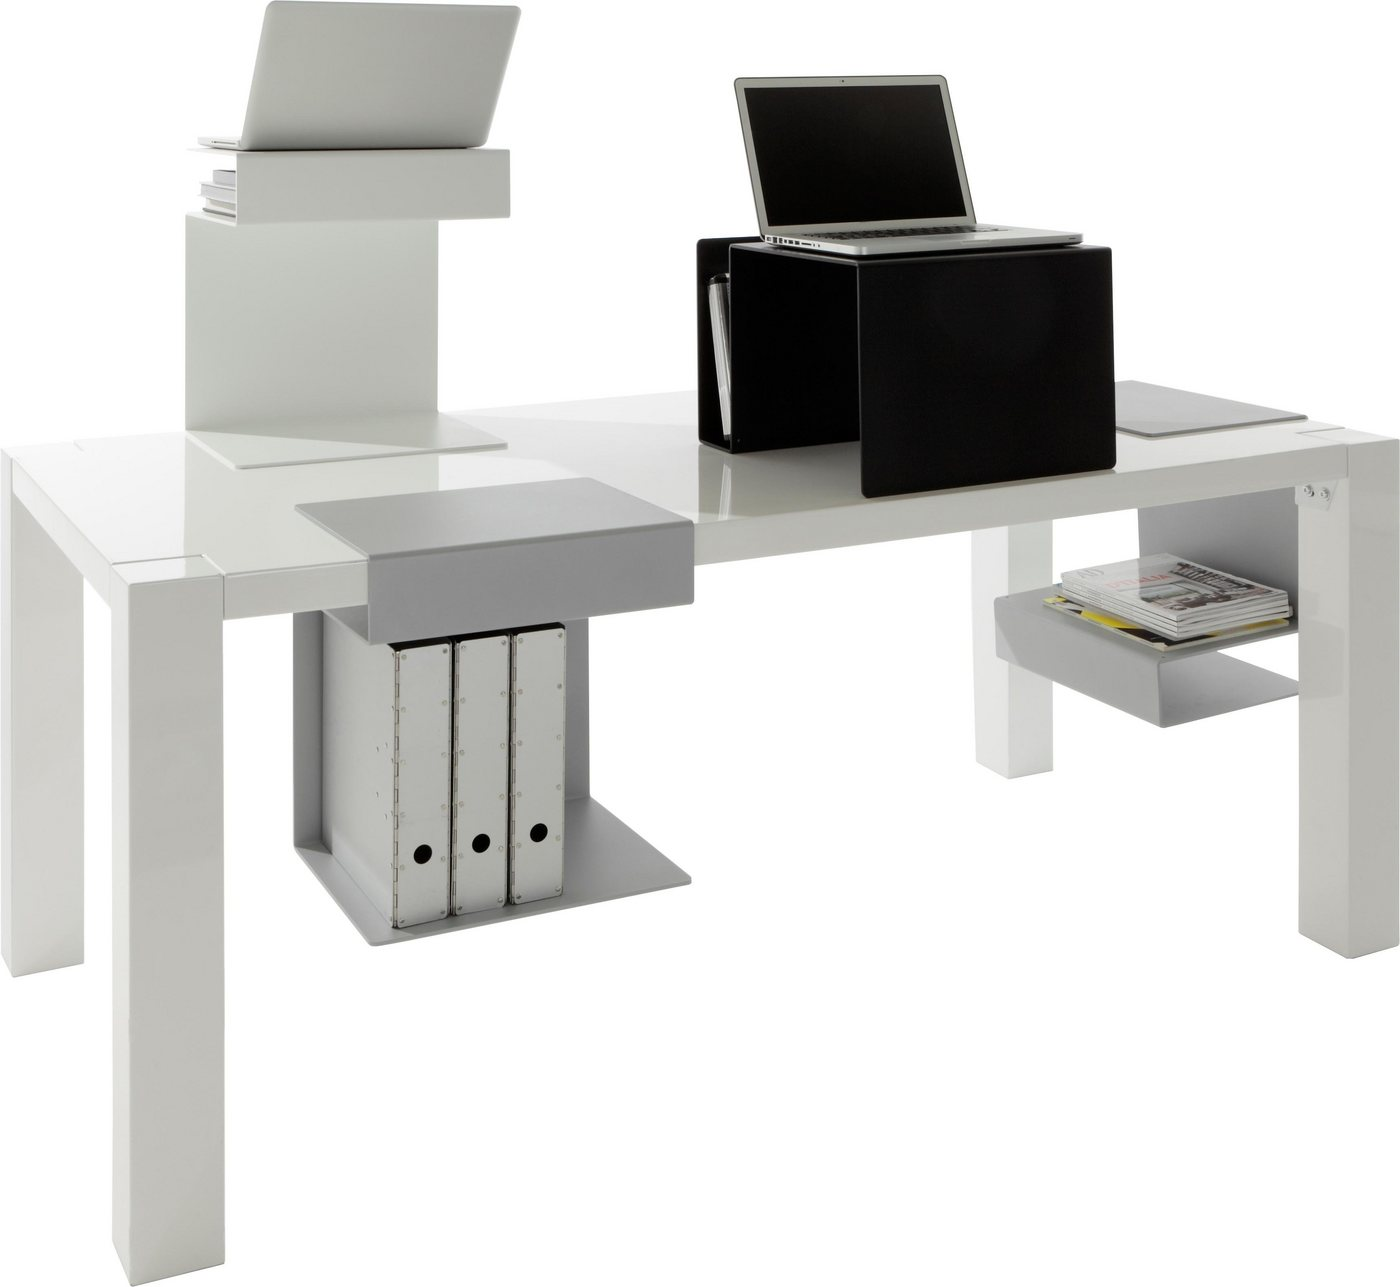 emform® bijzettafeltje HUK met leuk design van aluminium